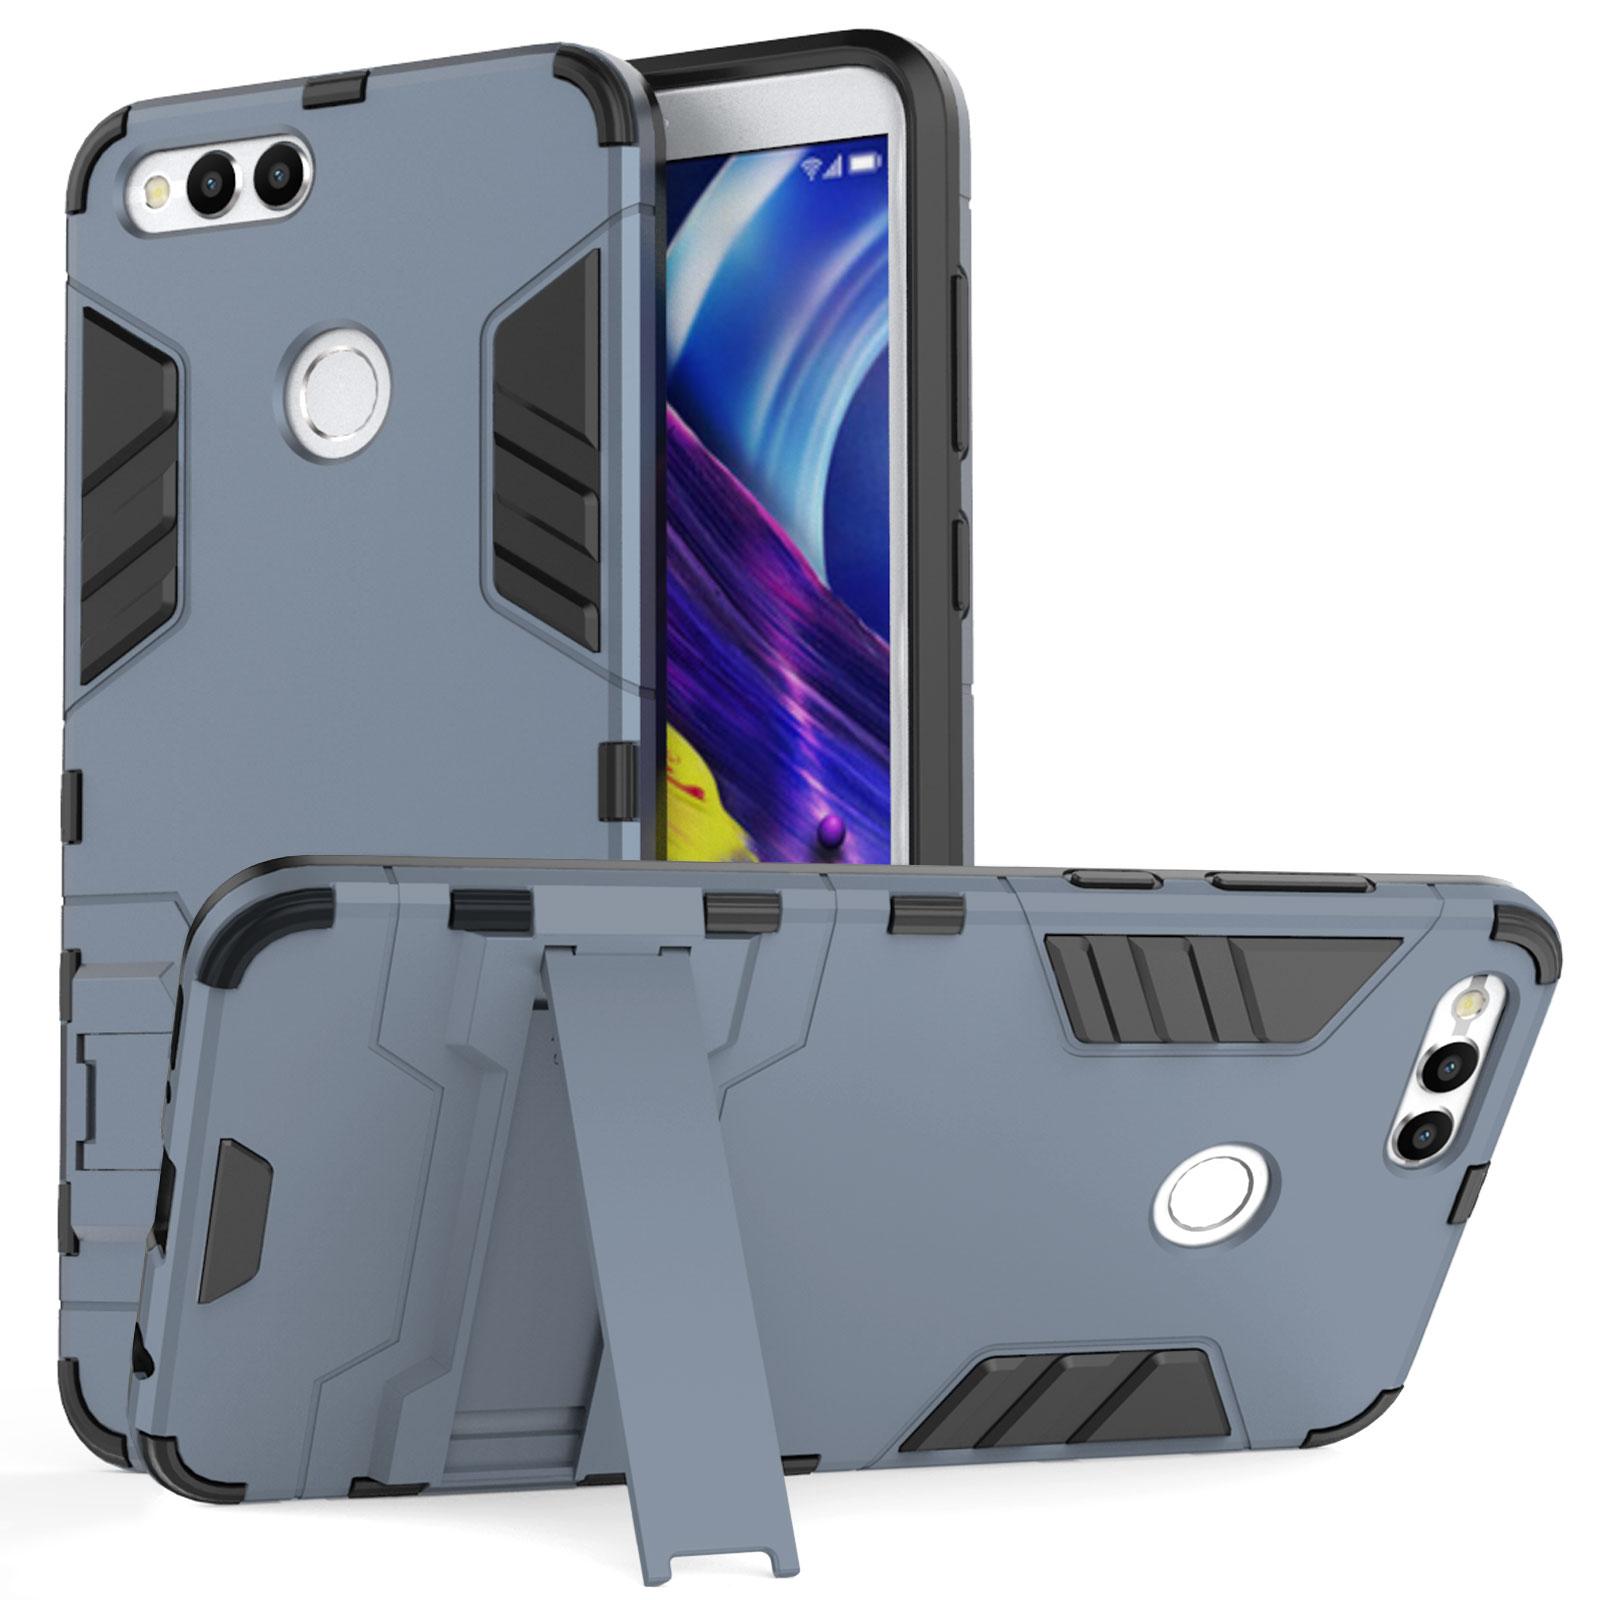 Caseflex Ανθεκτική Dual Layer Θήκη με Stand Honor 7x - Steel Blue & Screen Protector  (HU-AW03-Z528)